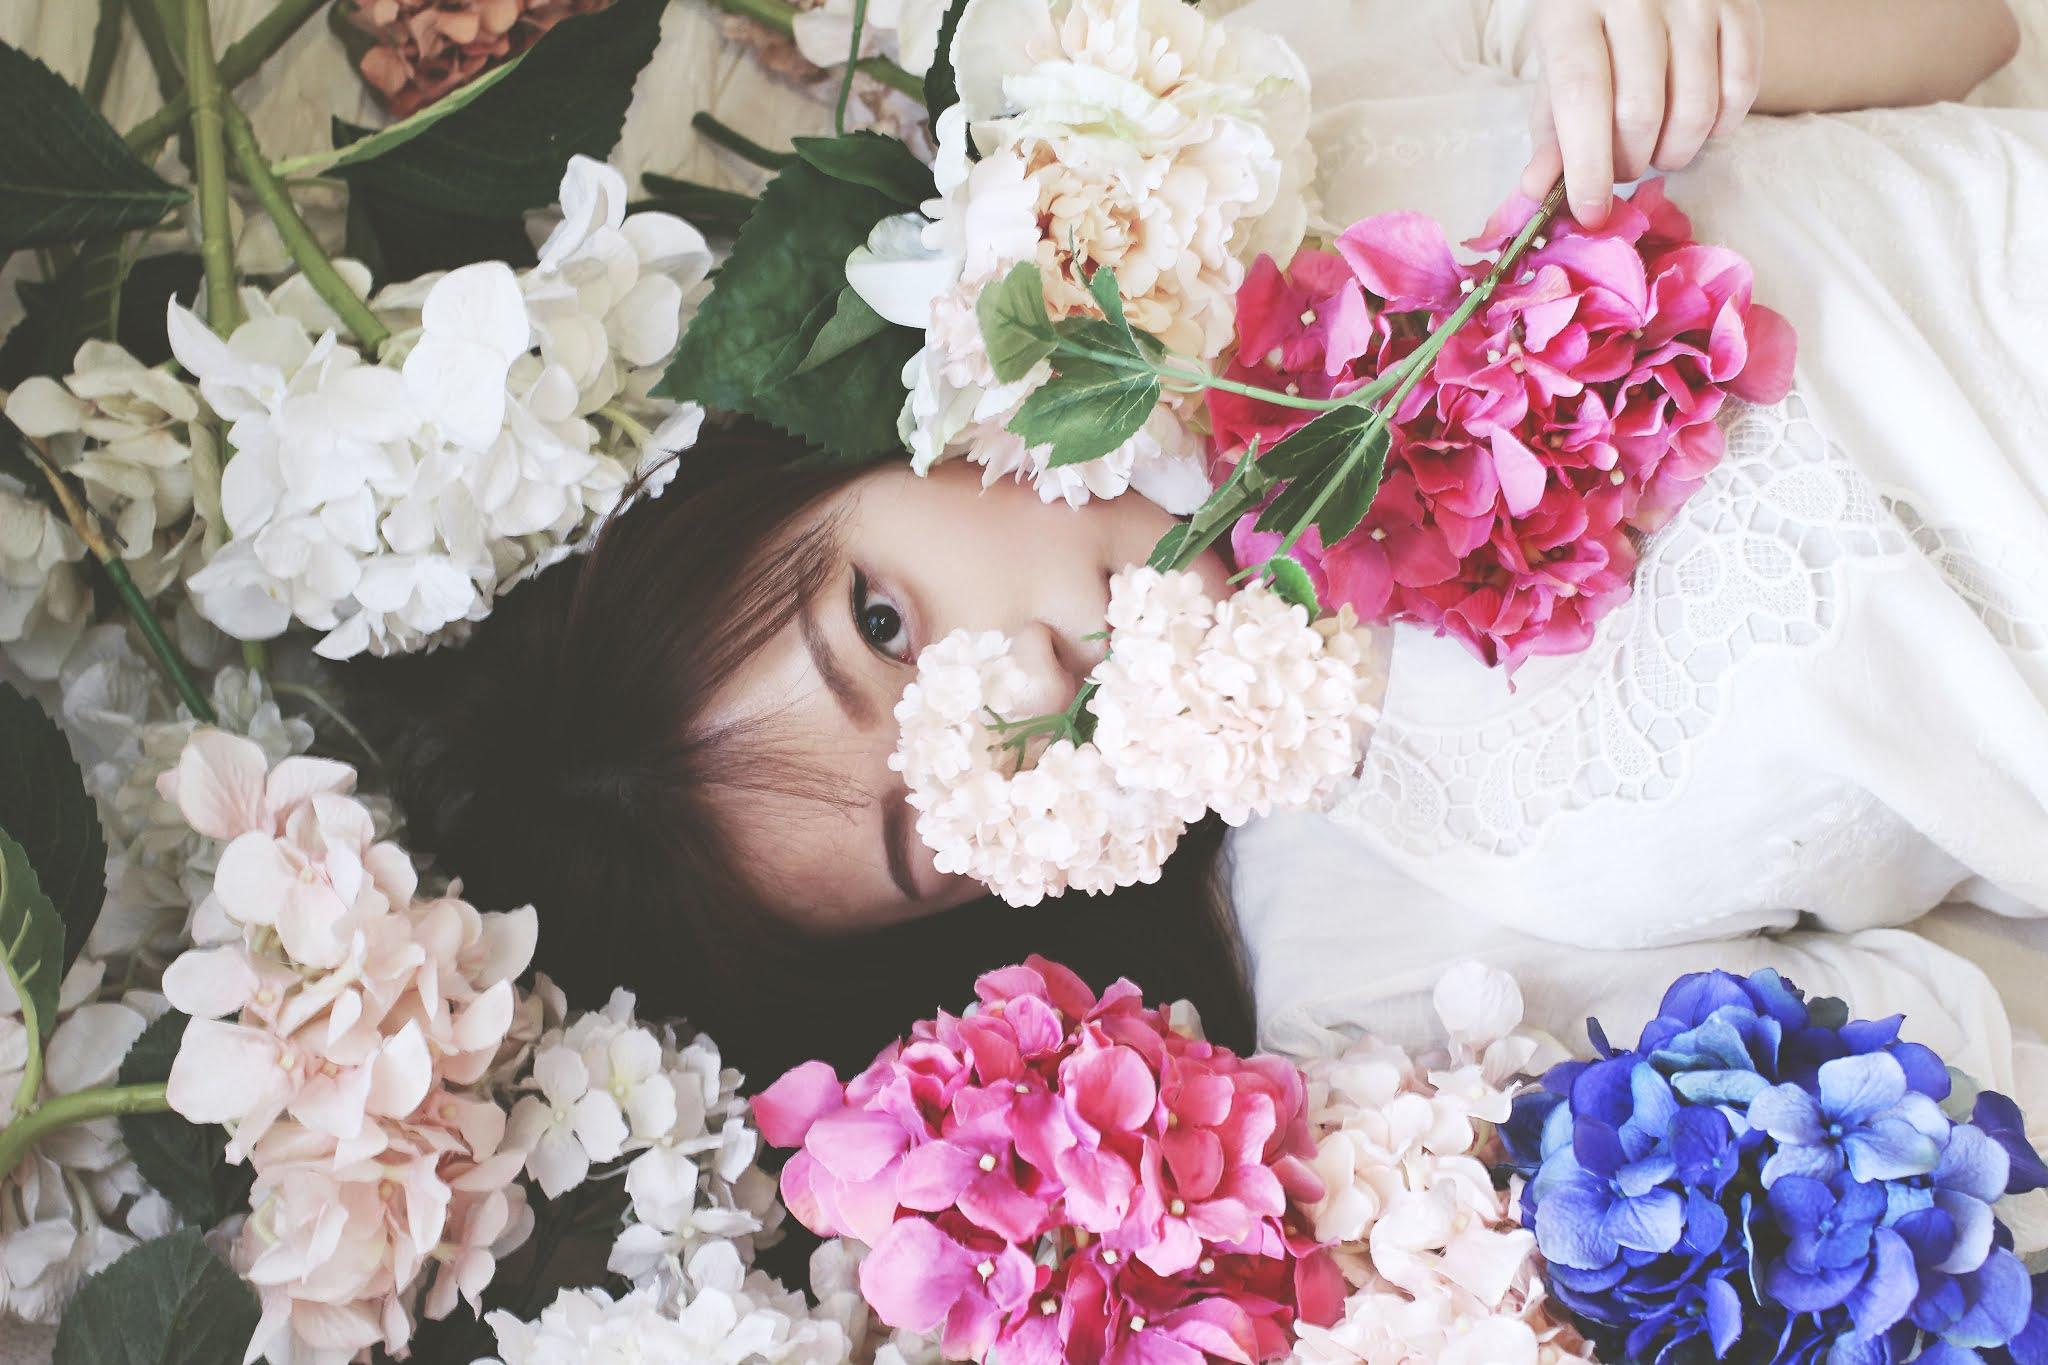 Best Portrait Photography Tips, Top 9 Best Portrait Photography Tips, Best Tips for portrait photography